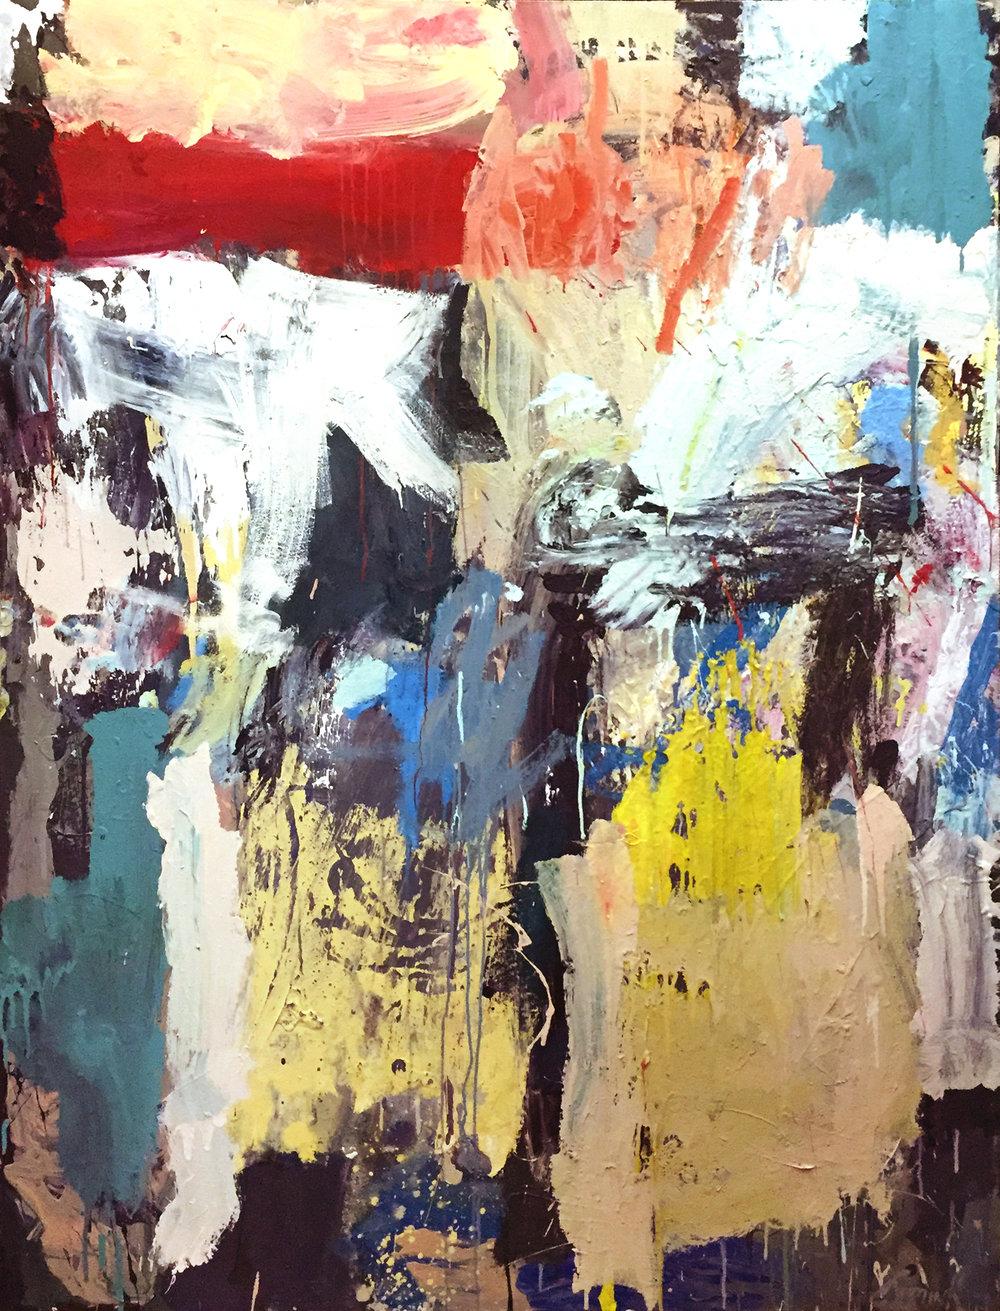 Untitled (77 x 55)